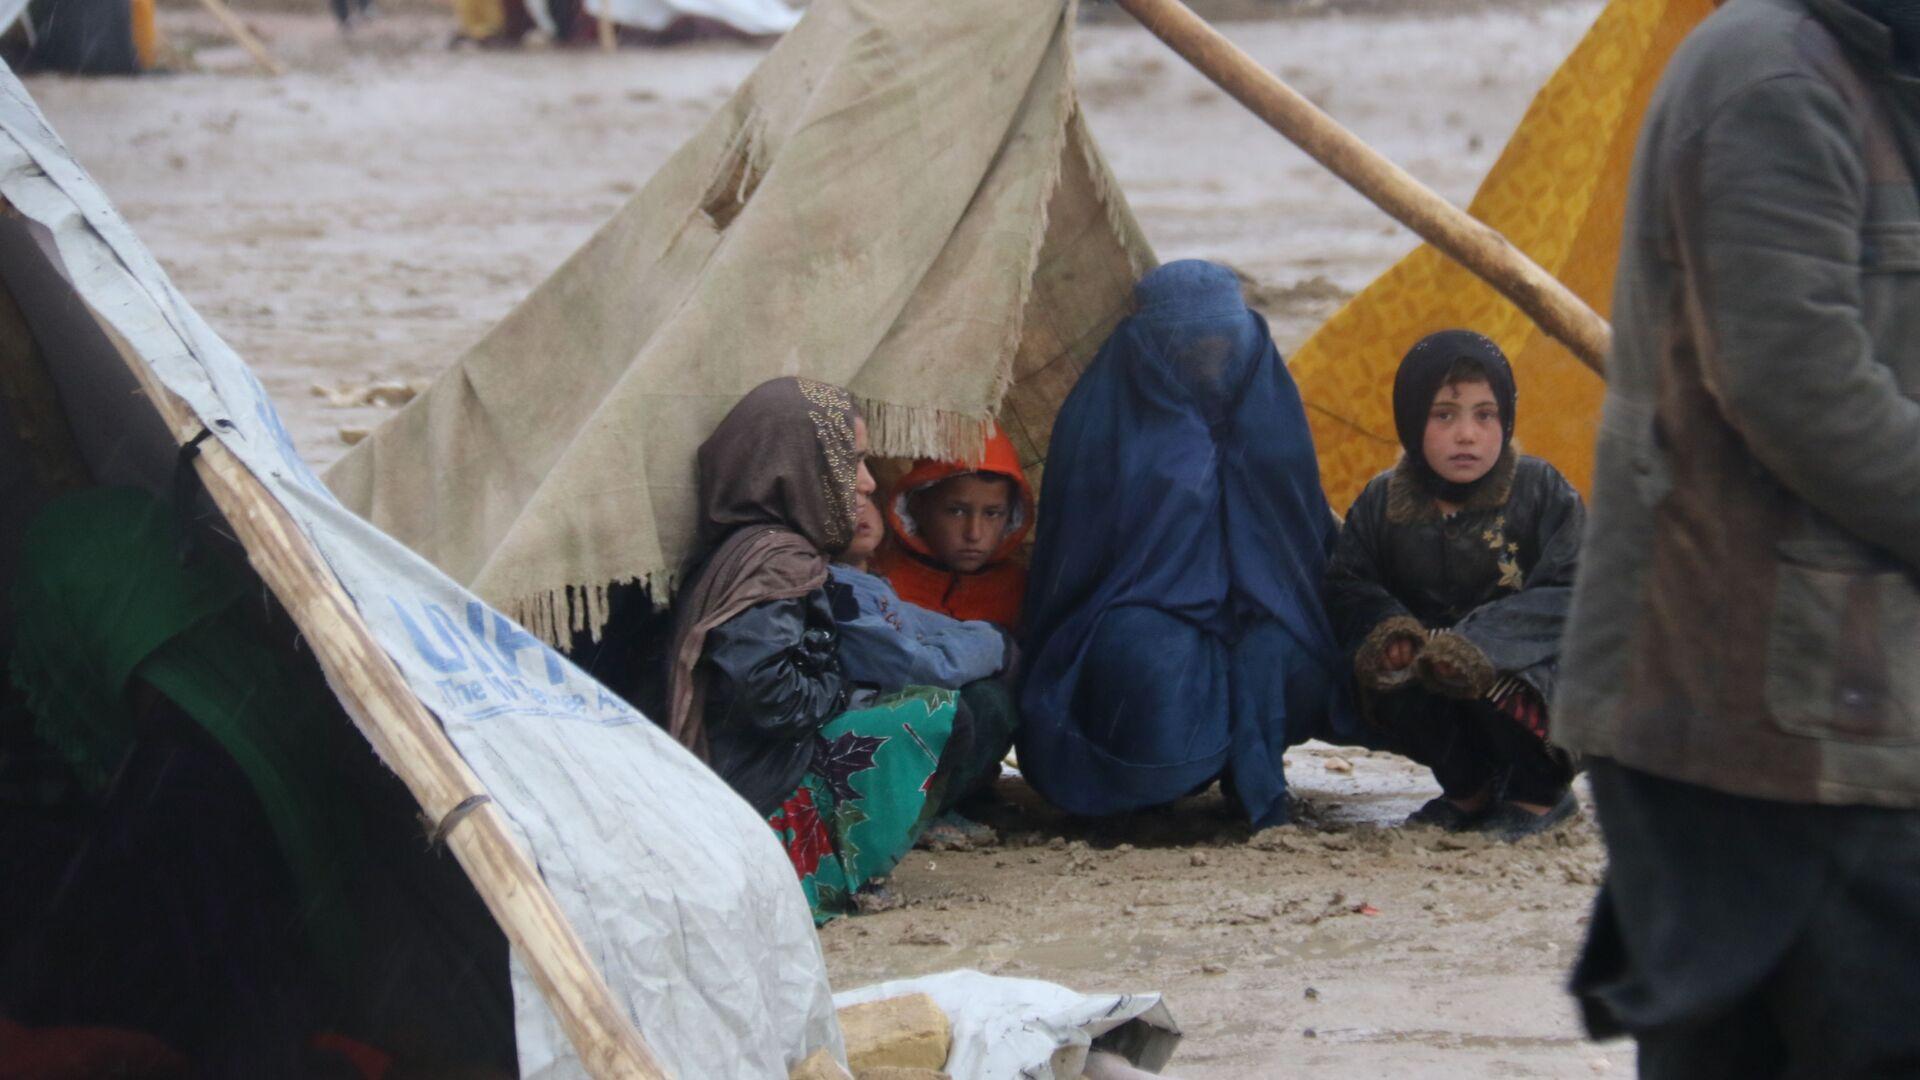 Rifugiati afghani a Mazar-i Sharif - Sputnik Italia, 1920, 30.08.2021